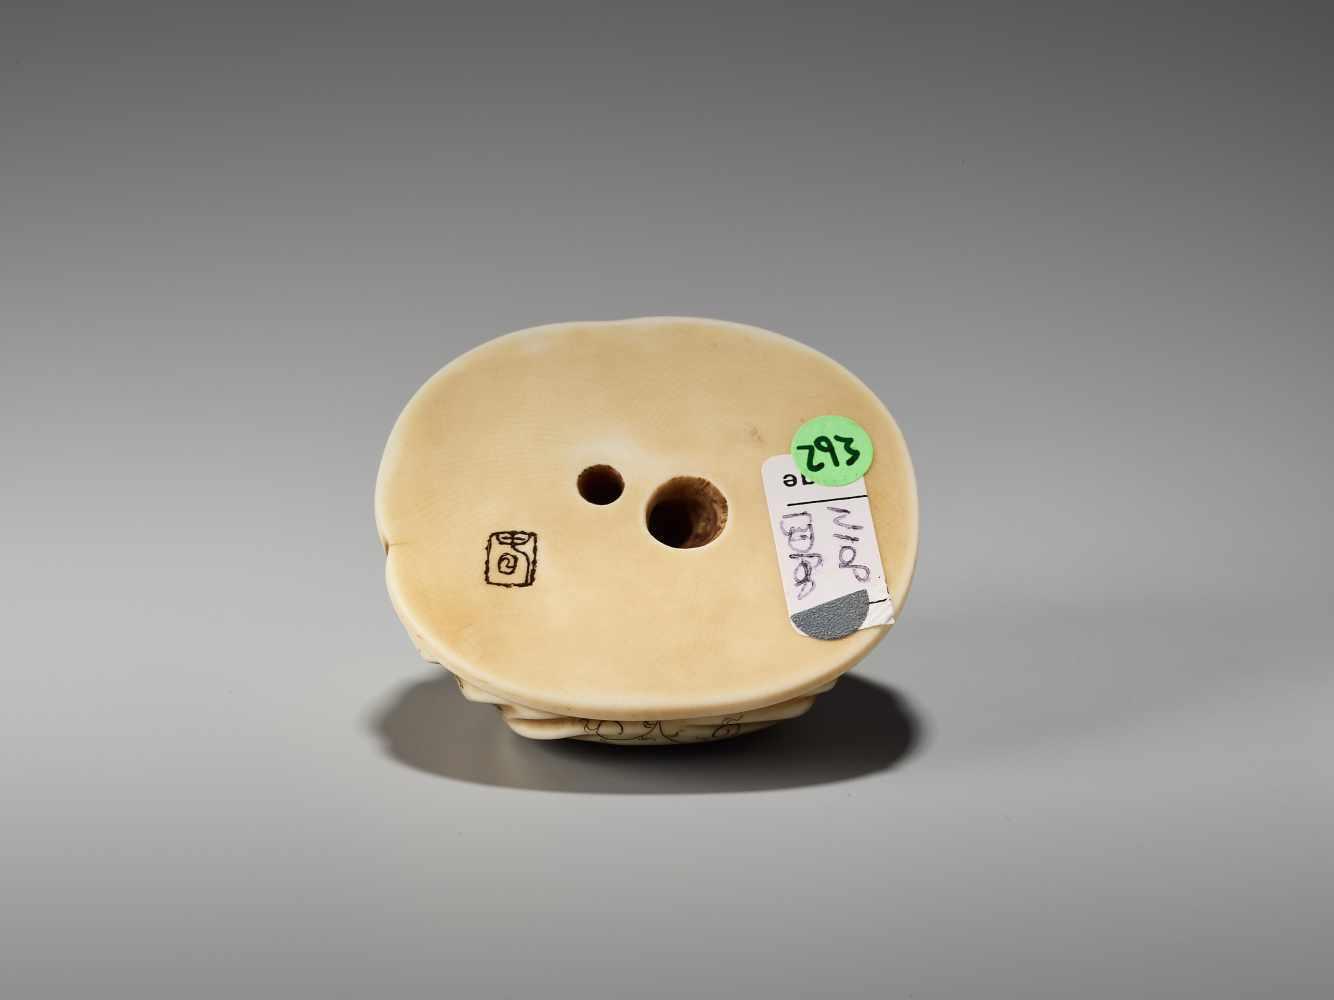 Lot 30 - AN IVORY NETSUKE OKIMONO OF A BOY IN HOTEI'S BAGSigned in seal form Tanaka, ivory netsuke-